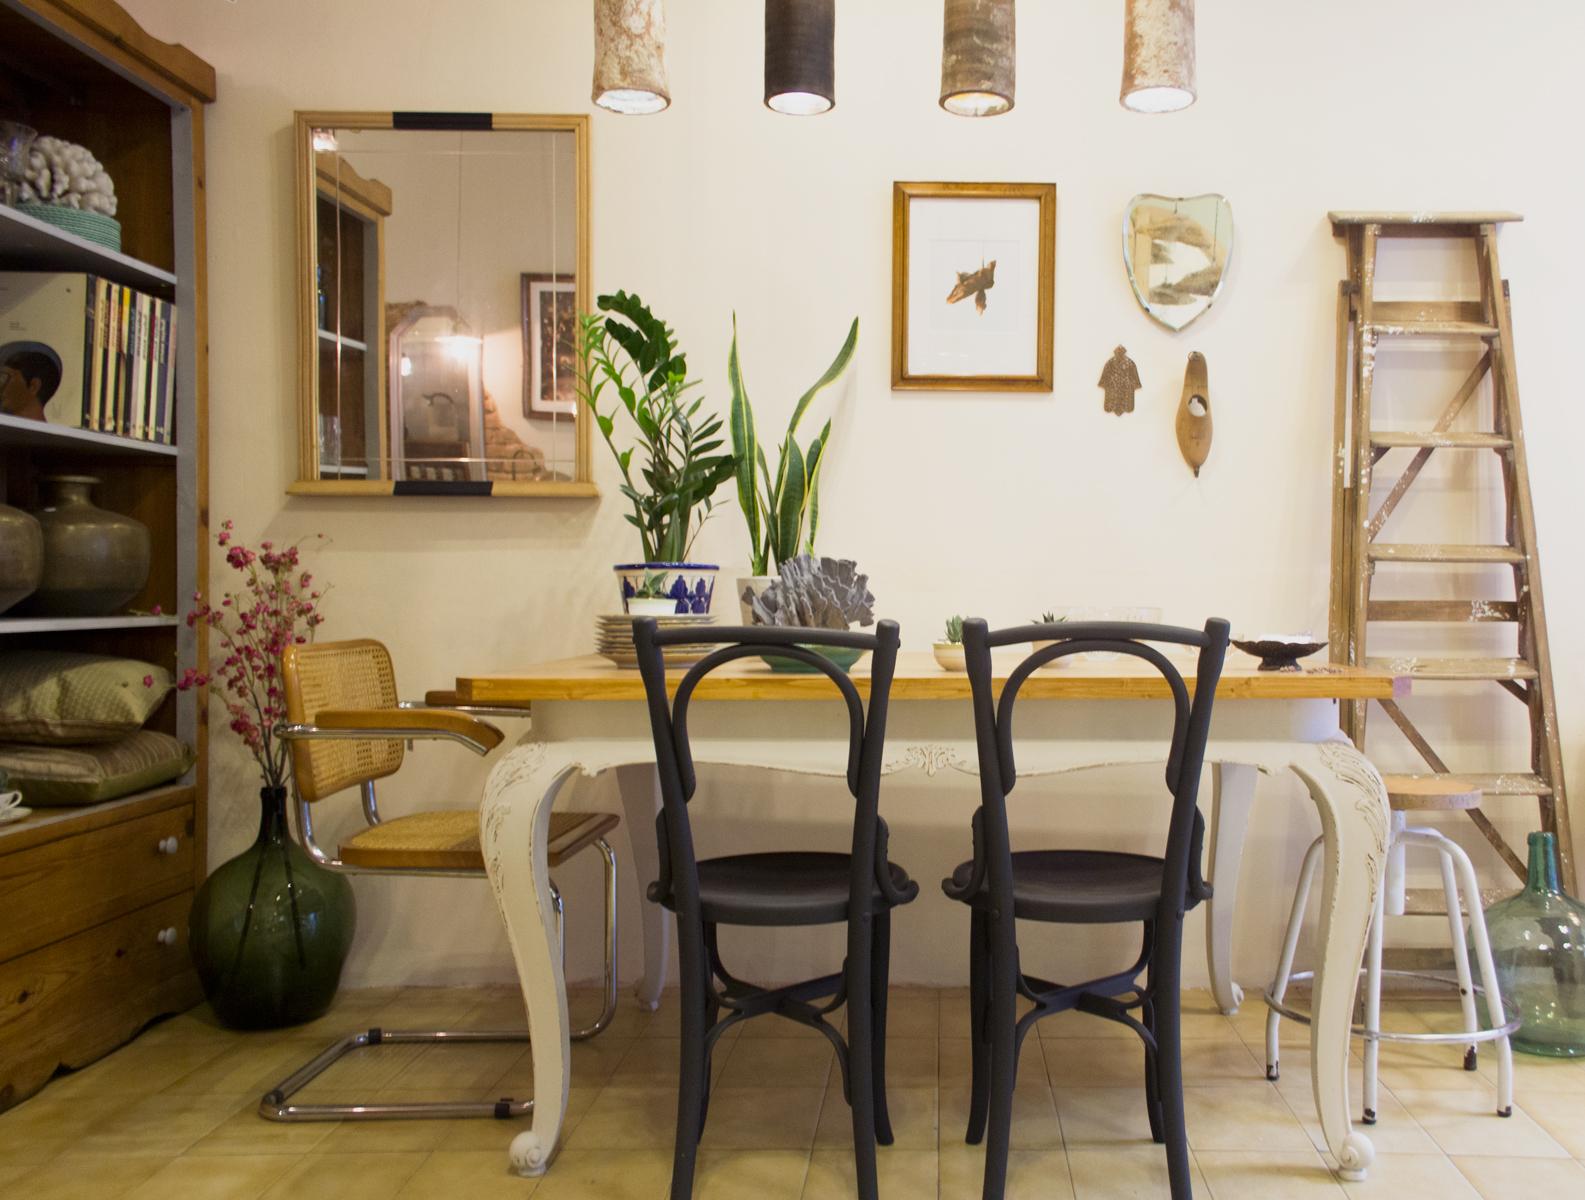 Rincón comedor pared malva. Studio Alis